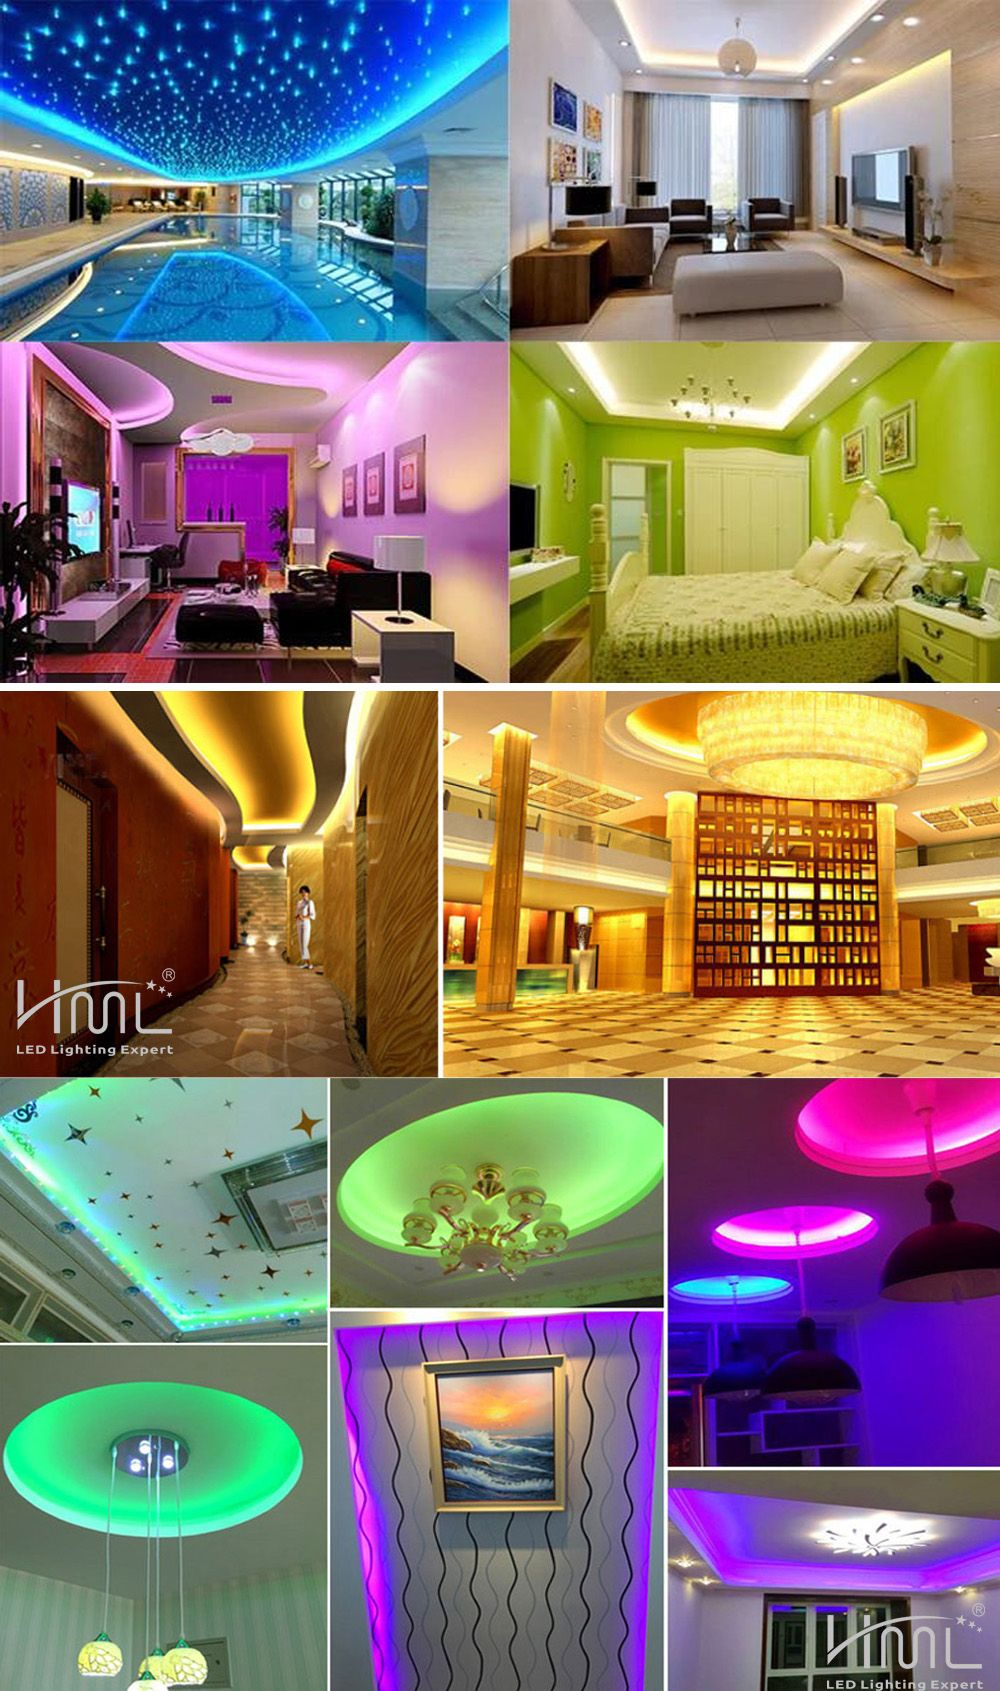 HML 5M LED Strip Light 24W RGB SMD2835 300 LEDs 2pcs with IR 24 Keys Remote Control and DC Adapter(EU Plug)